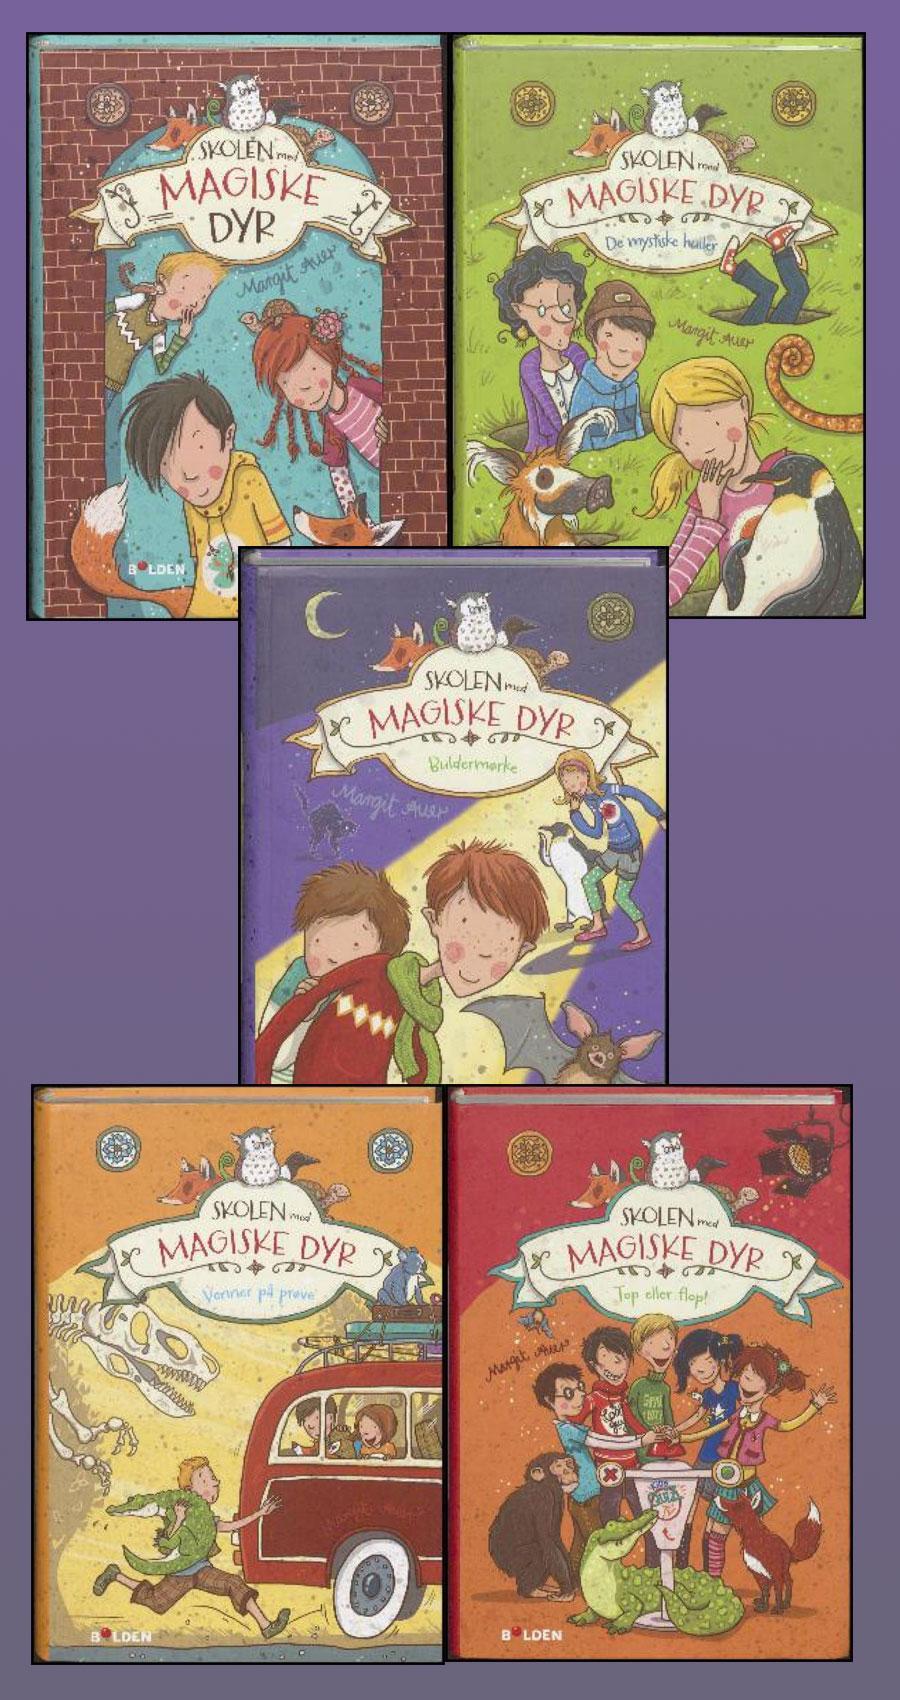 Skolen med magiske dyr